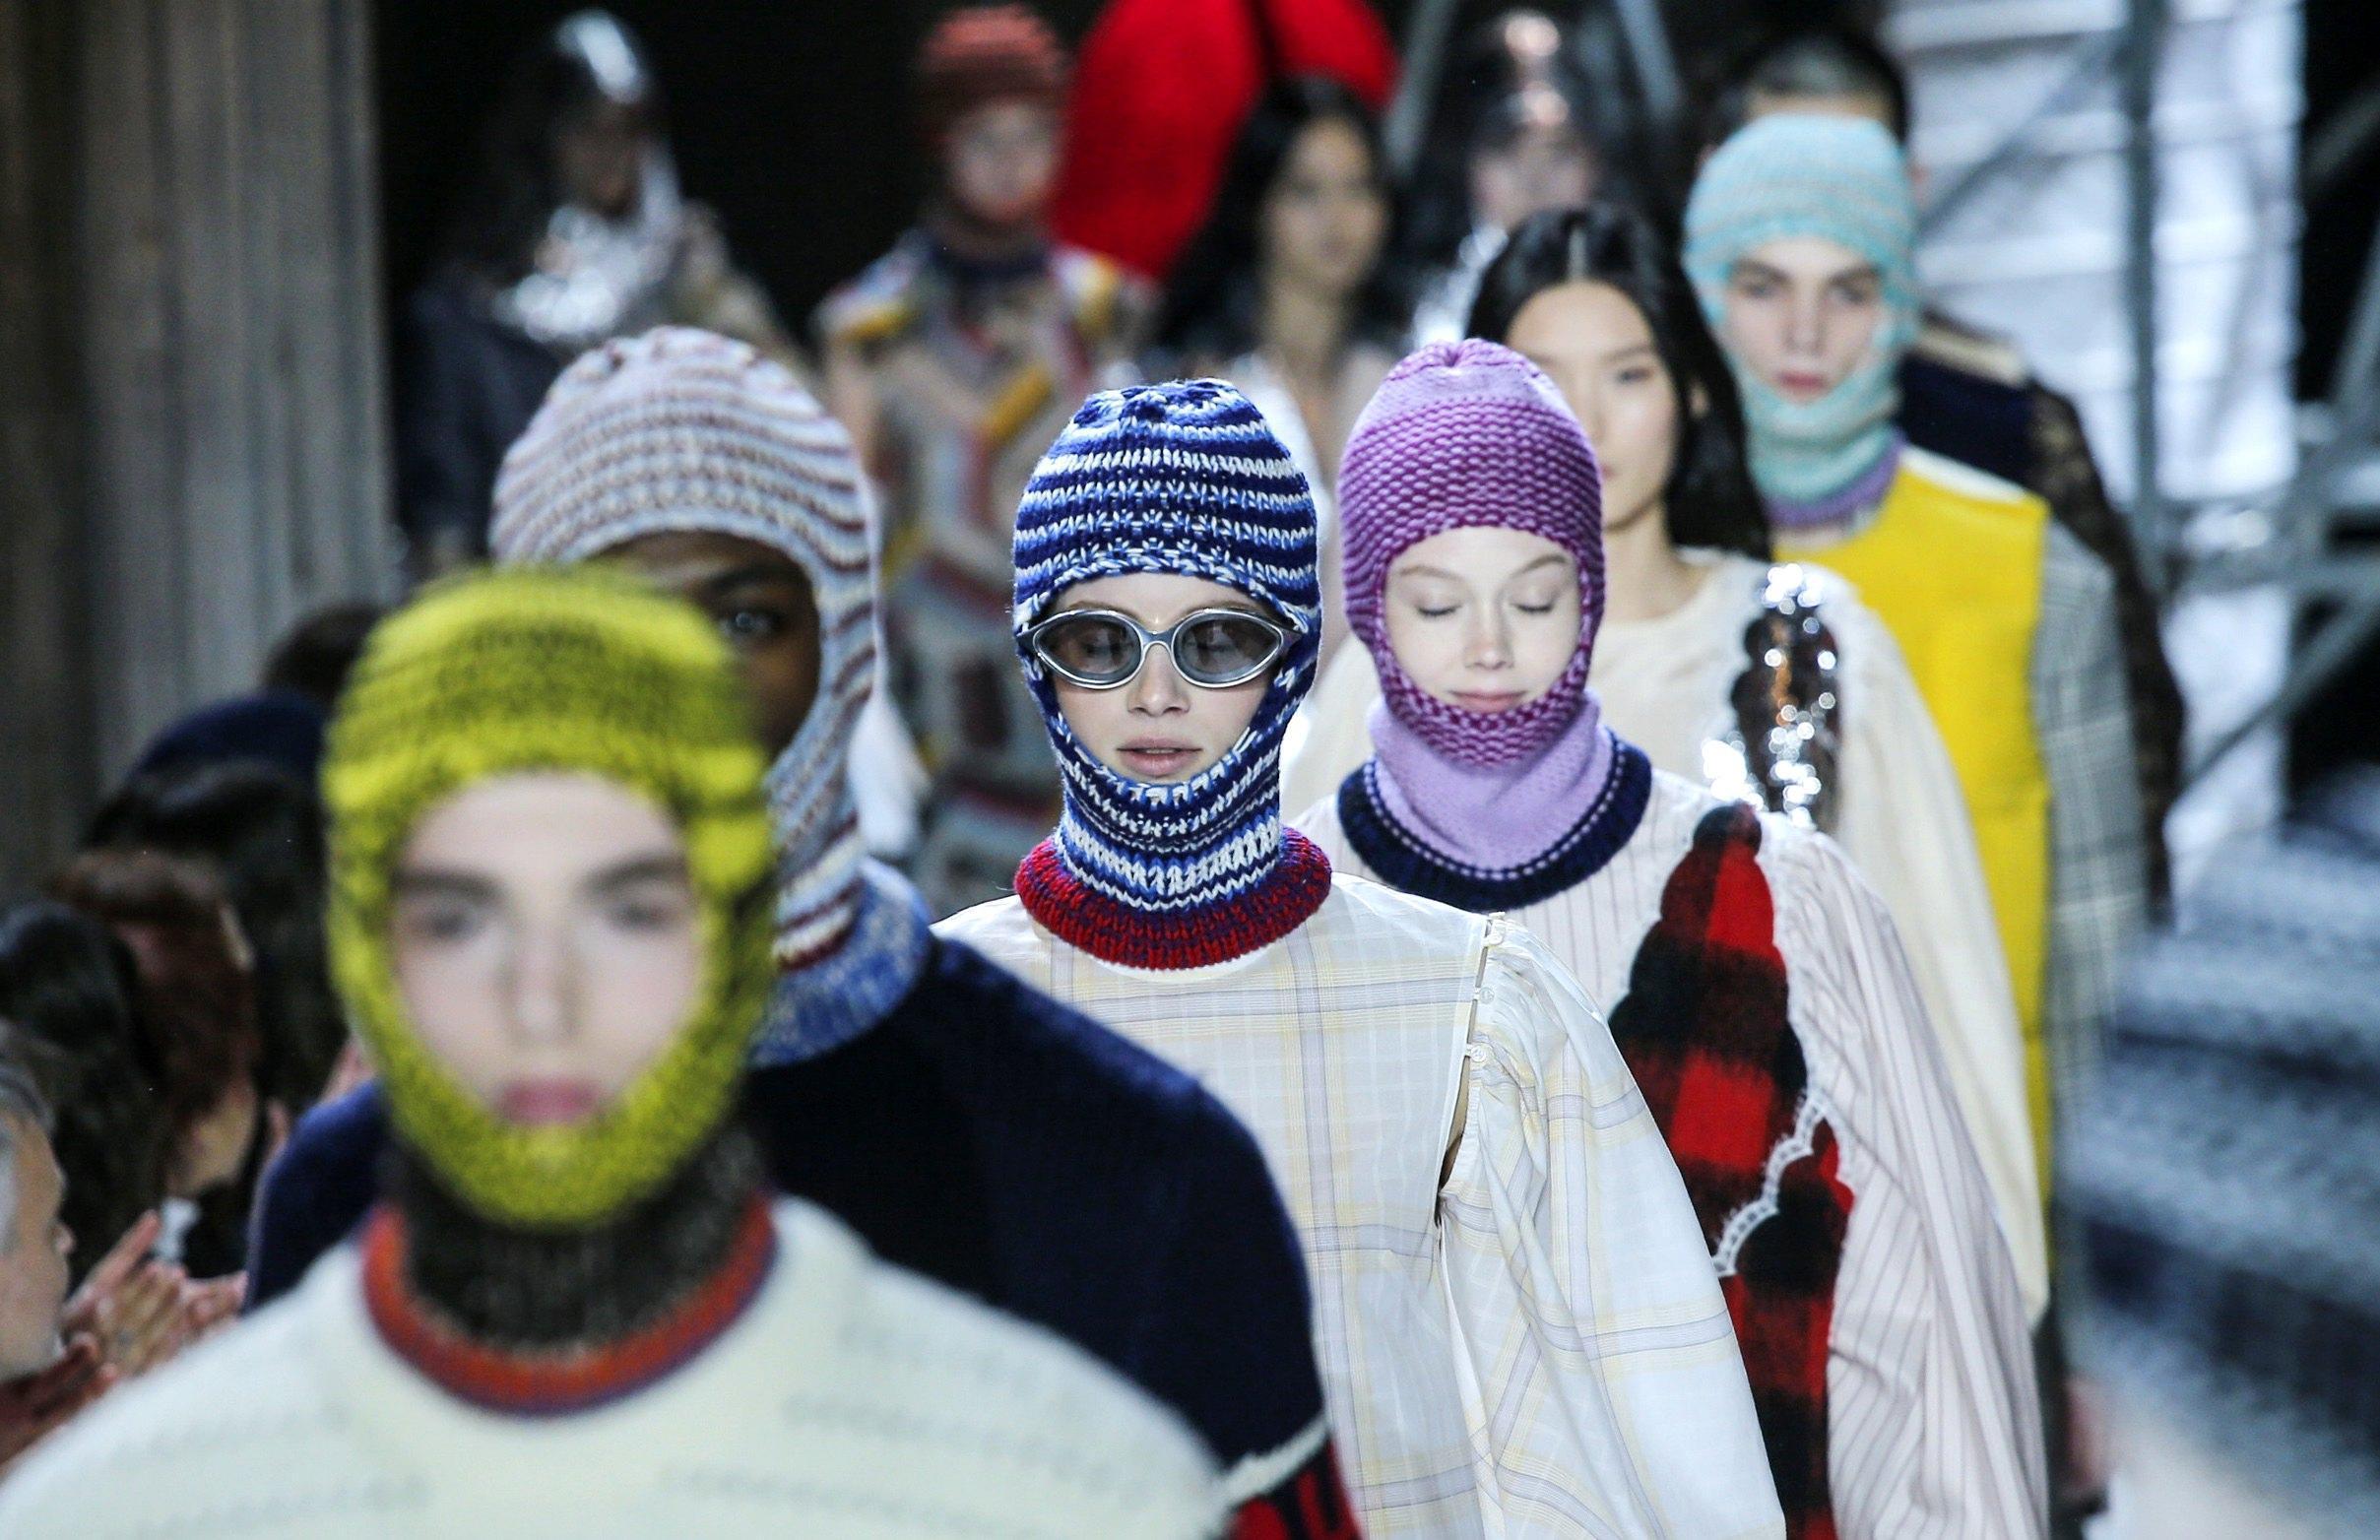 Cappelli donna passamontagna Calvin Klein